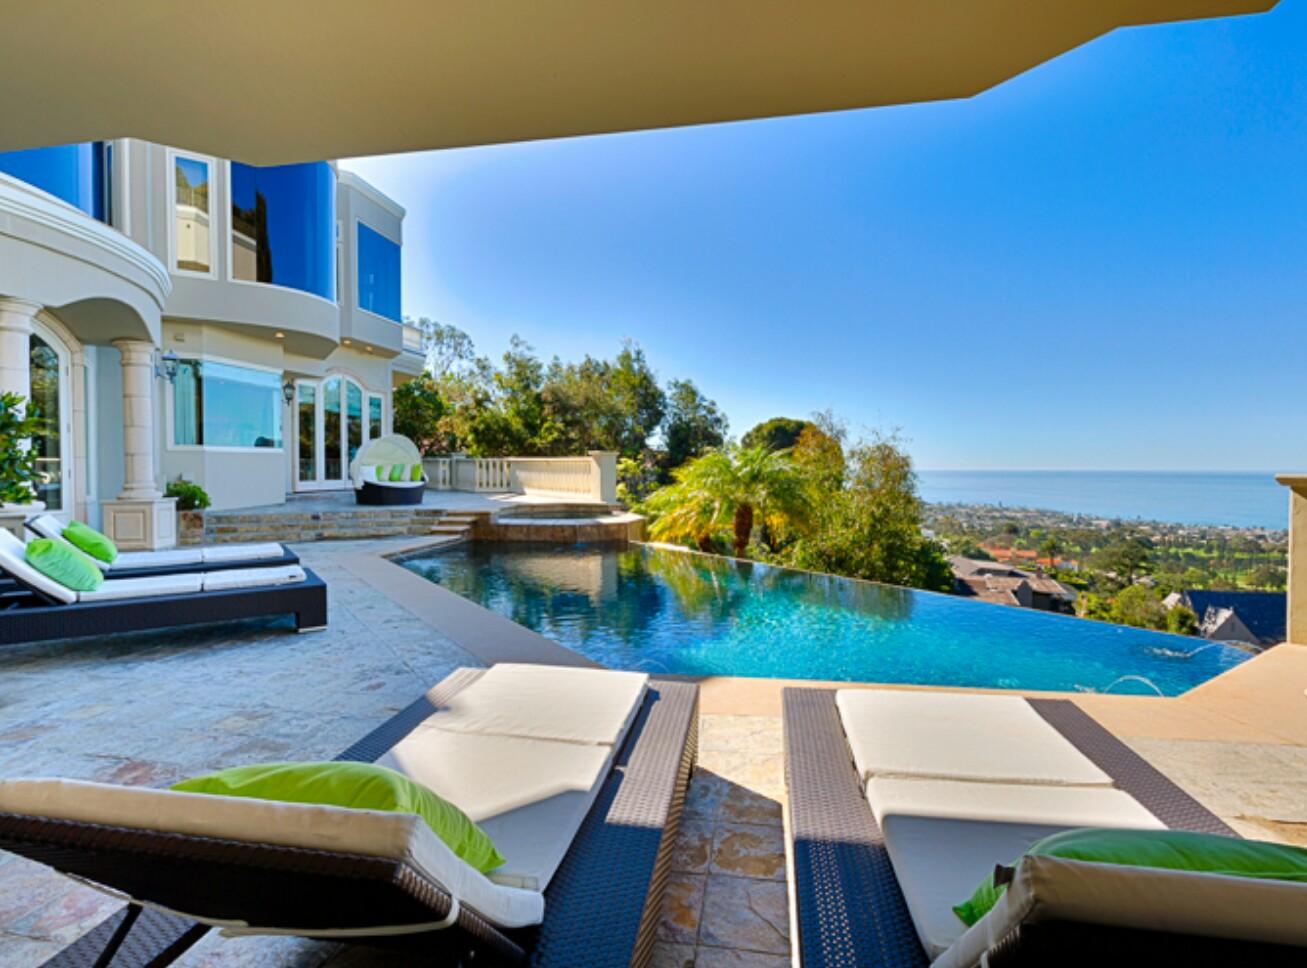 Monarch Luxury Villas La Jolla Southern California Luxurious Vacation Rental Home